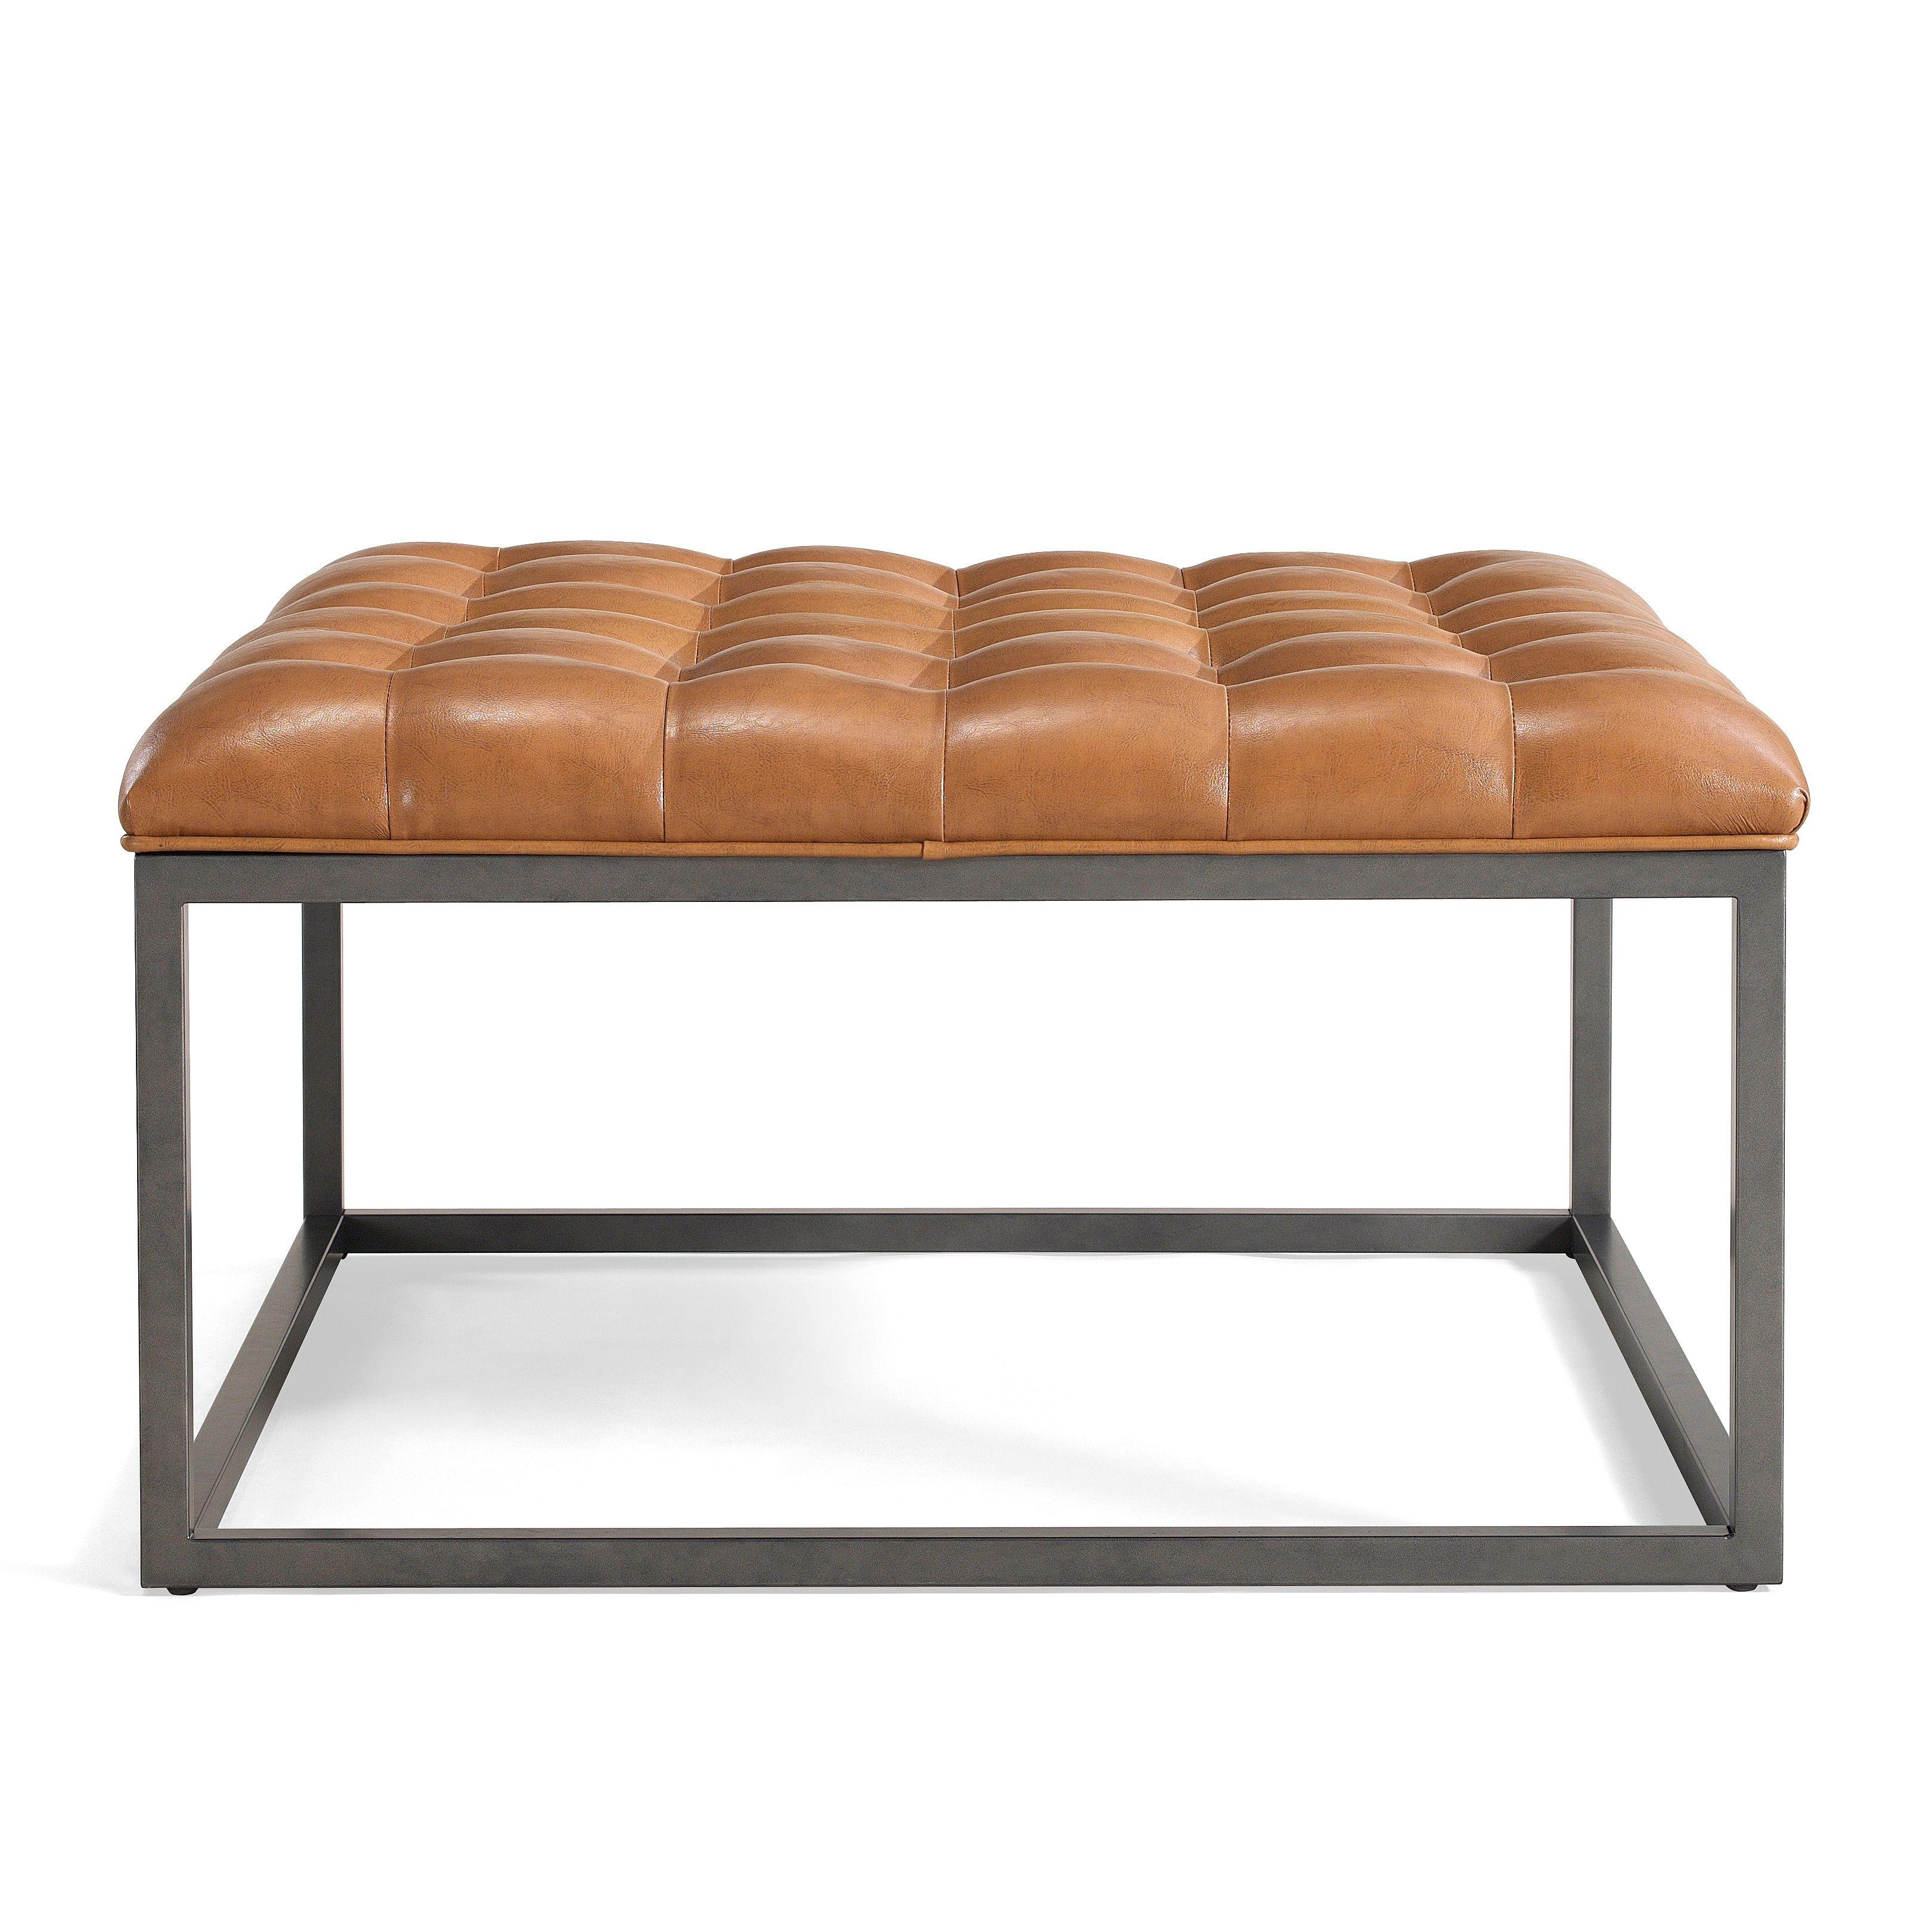 Terrific Healy Saddle Brown Leather Tufted Ottoman Saddle Brown Inzonedesignstudio Interior Chair Design Inzonedesignstudiocom